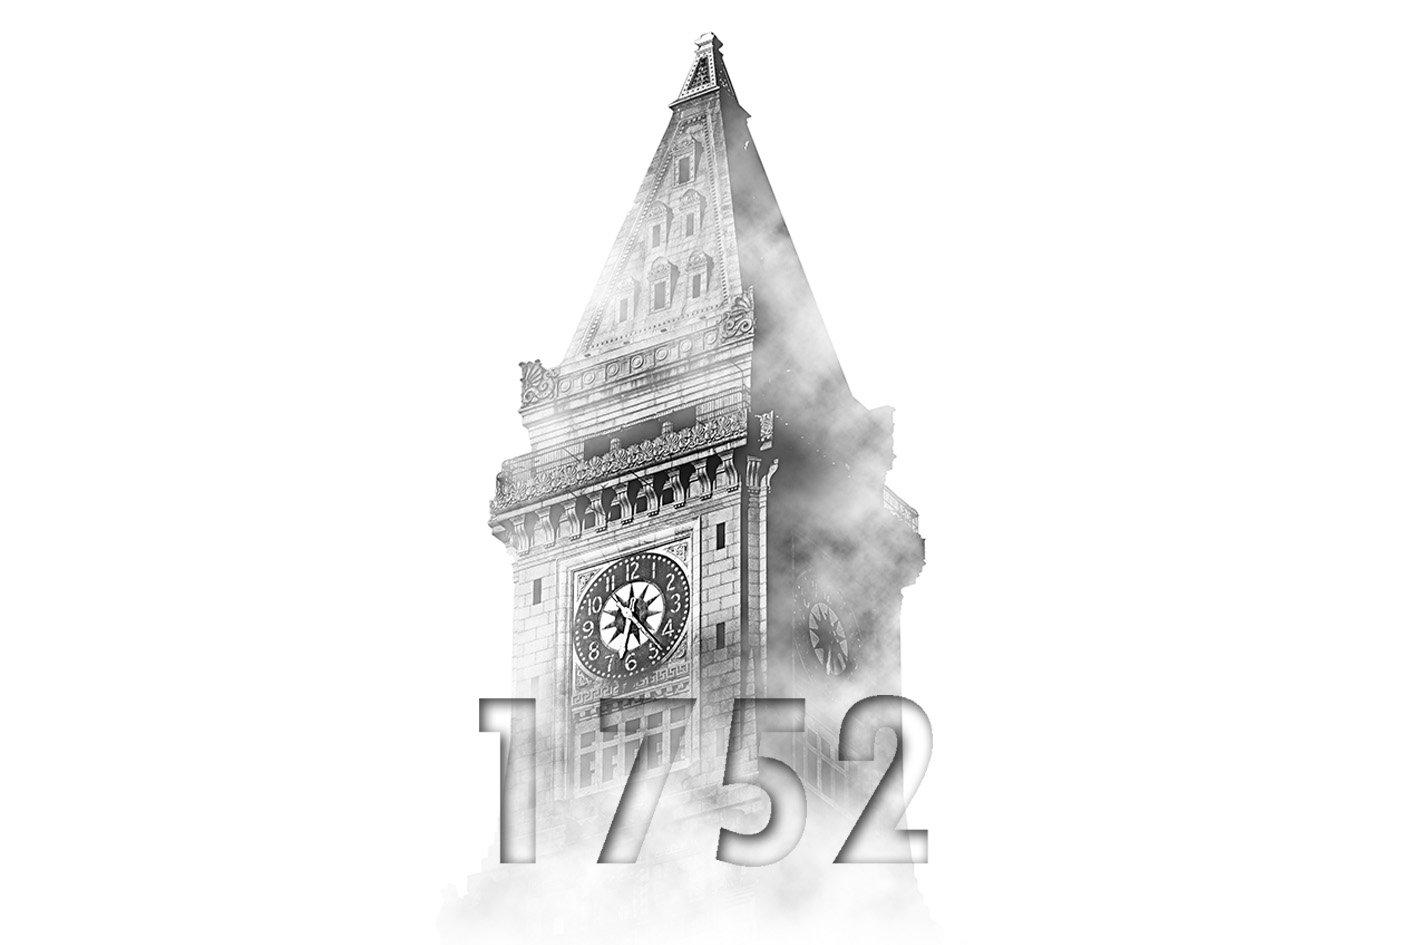 1752-ano